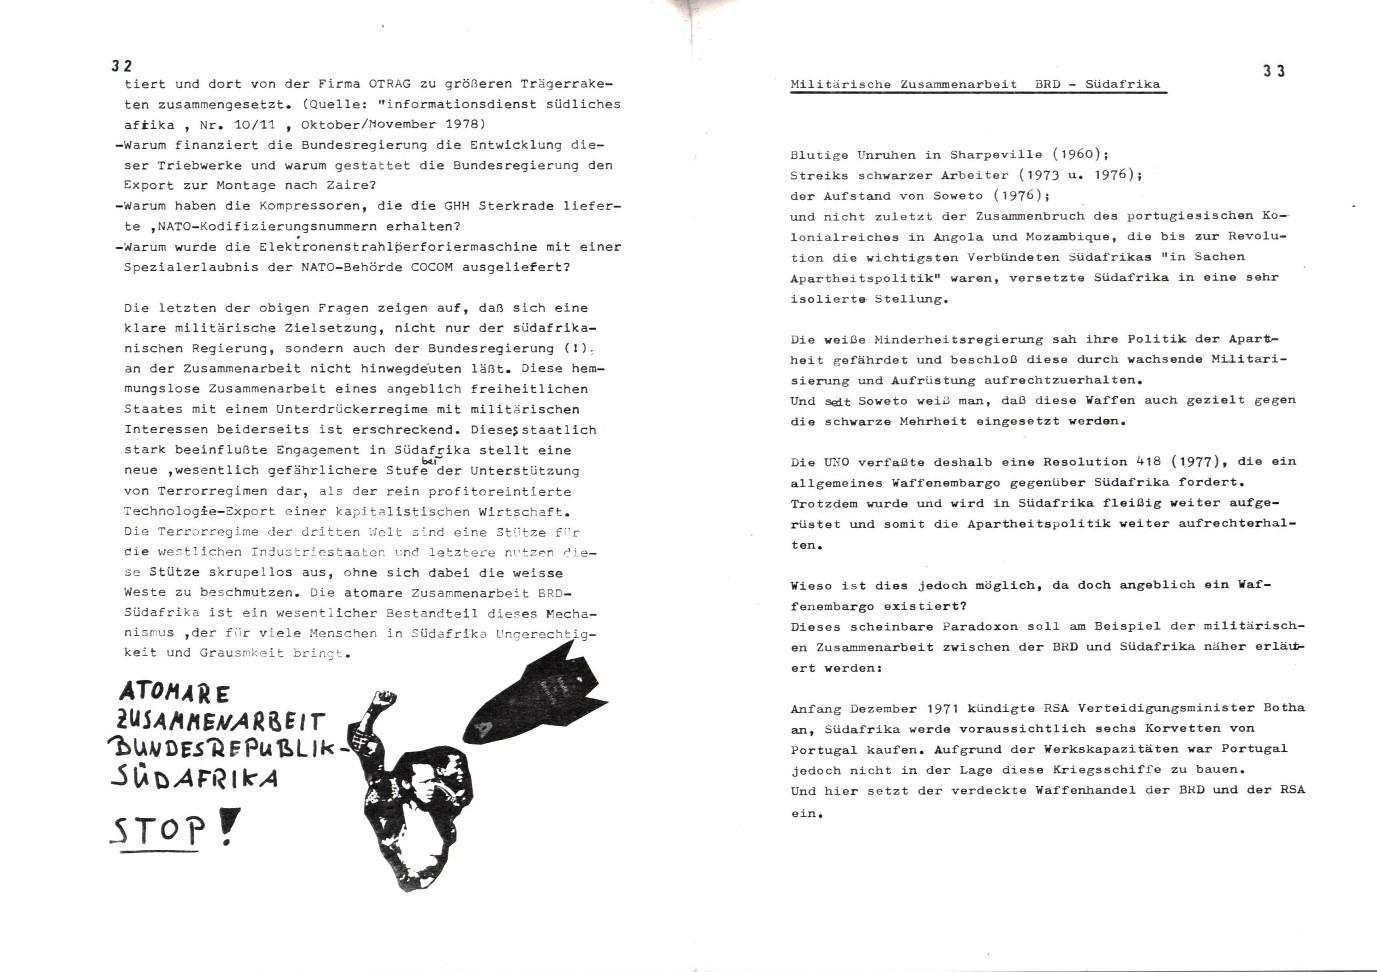 Muenster_AKAFRIK_1981_Suedafrika_BRD_18